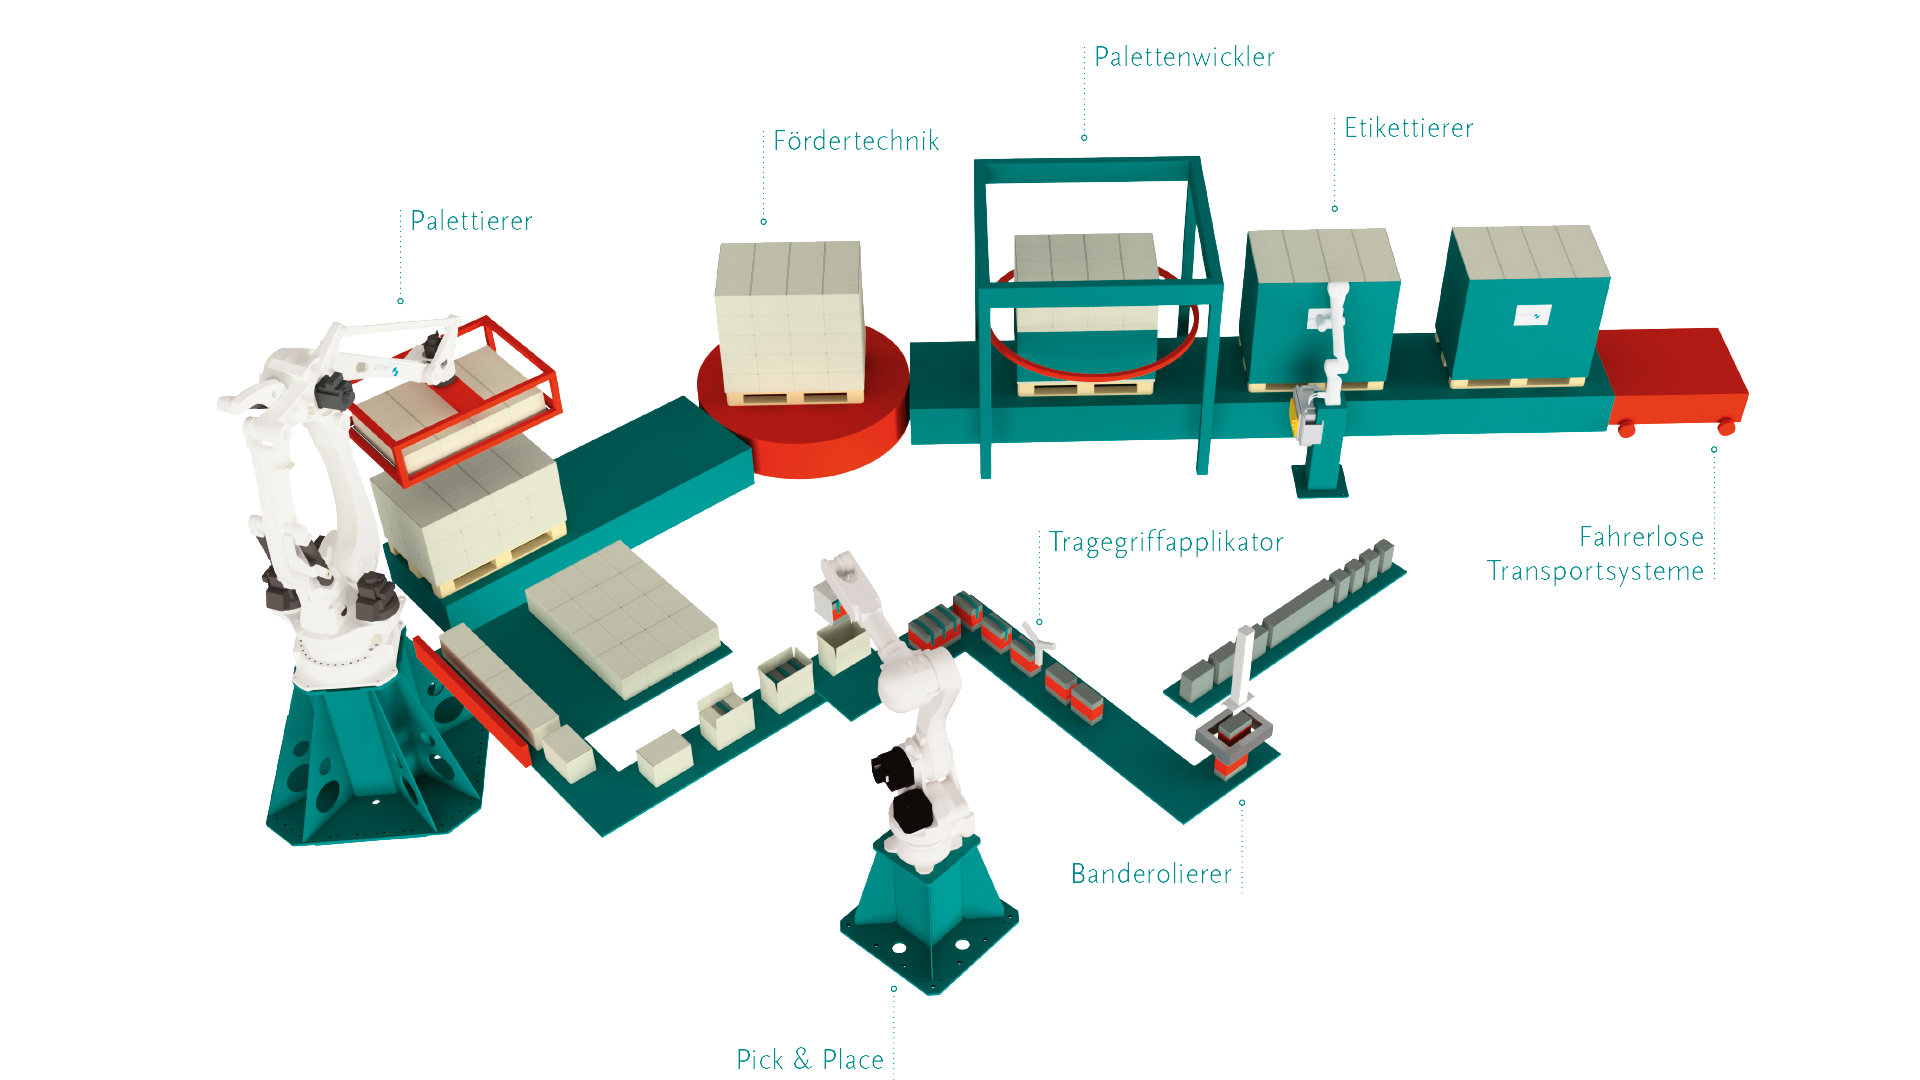 Produkte der project A&E GmbH